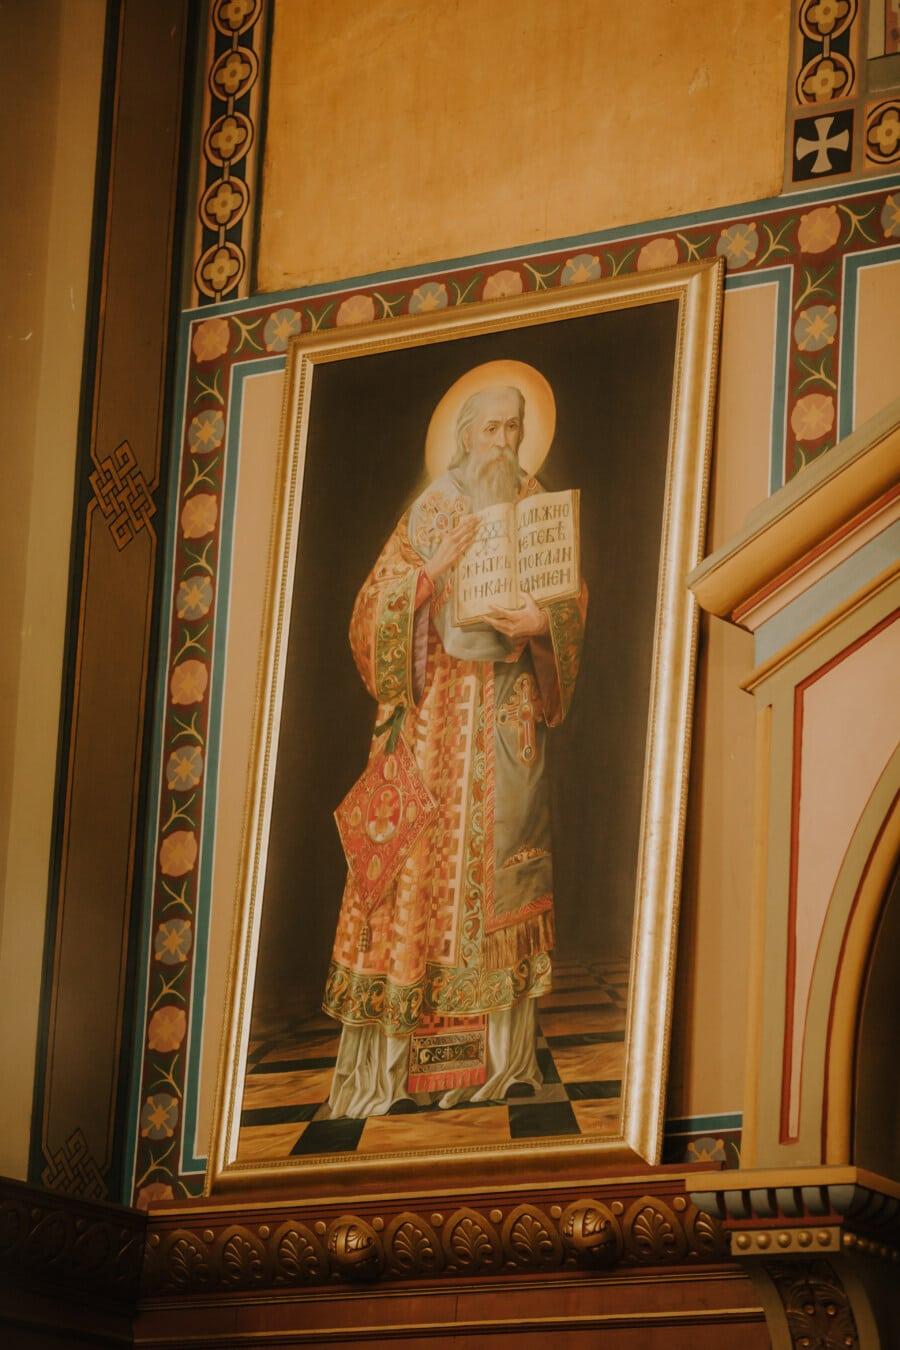 Wand, Heilige, Bildende Kunst, orthodoxe, Kapelle, Kirche, Religion, Porträt, Kunst, Malerei